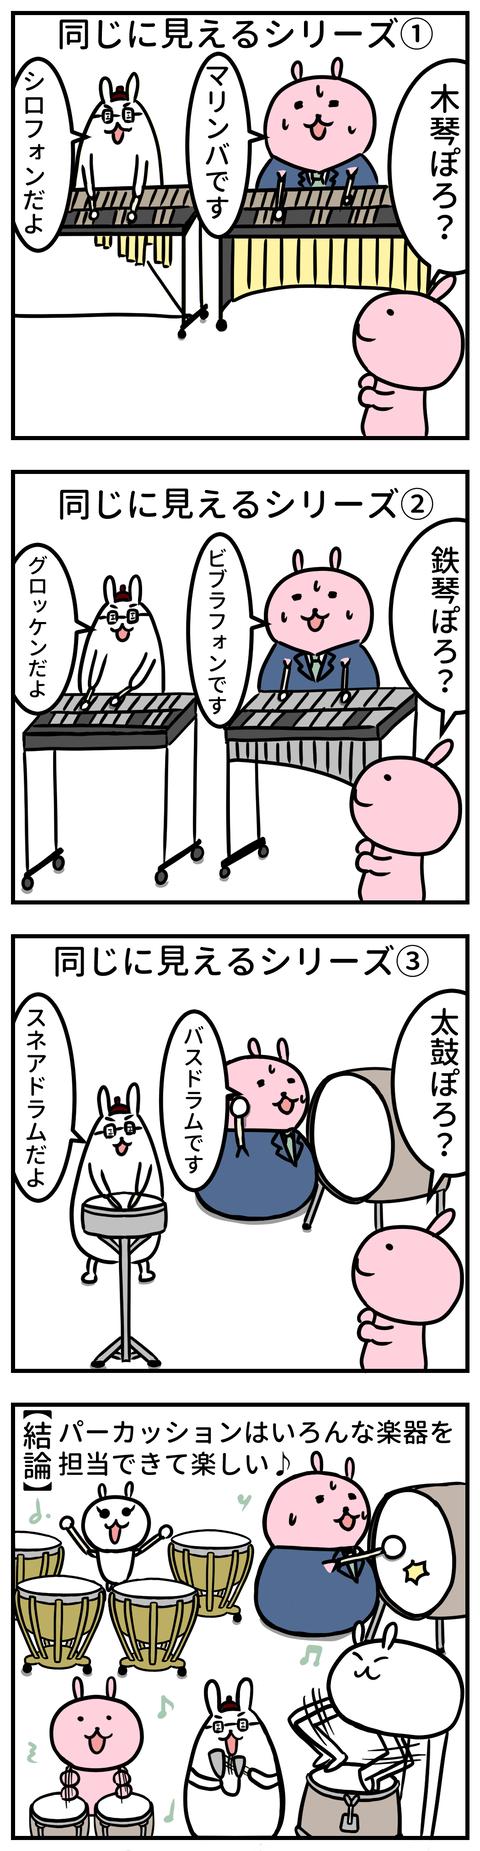 manga-yuzuporo68-1